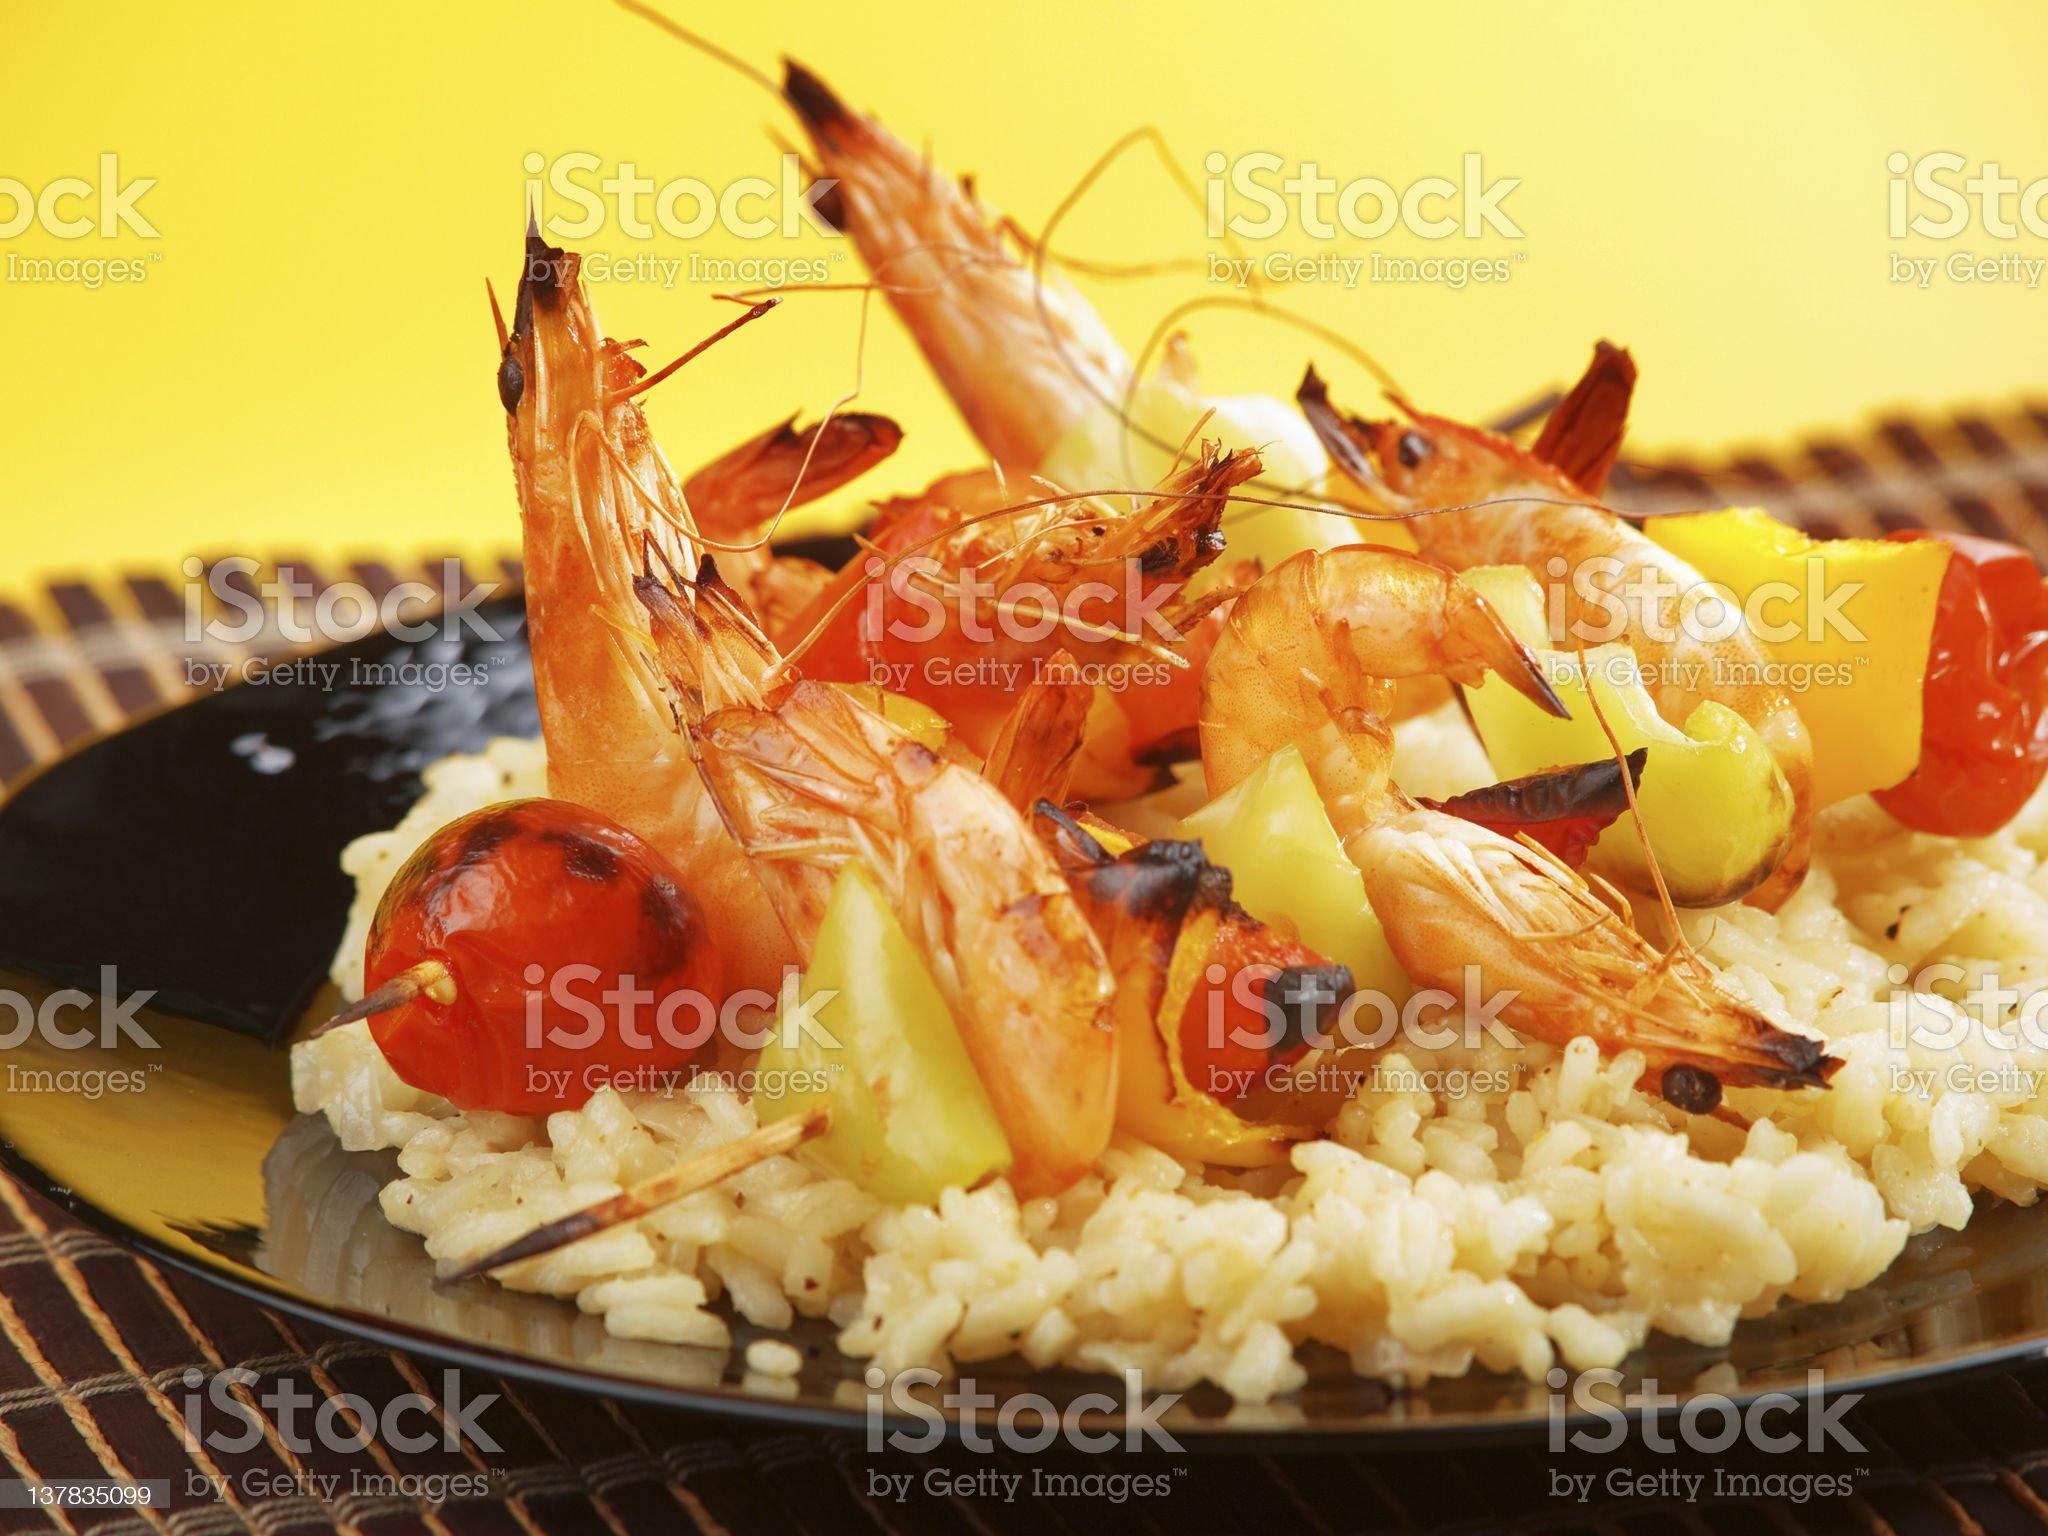 Snrimp skewer on rice royalty-free stock photo